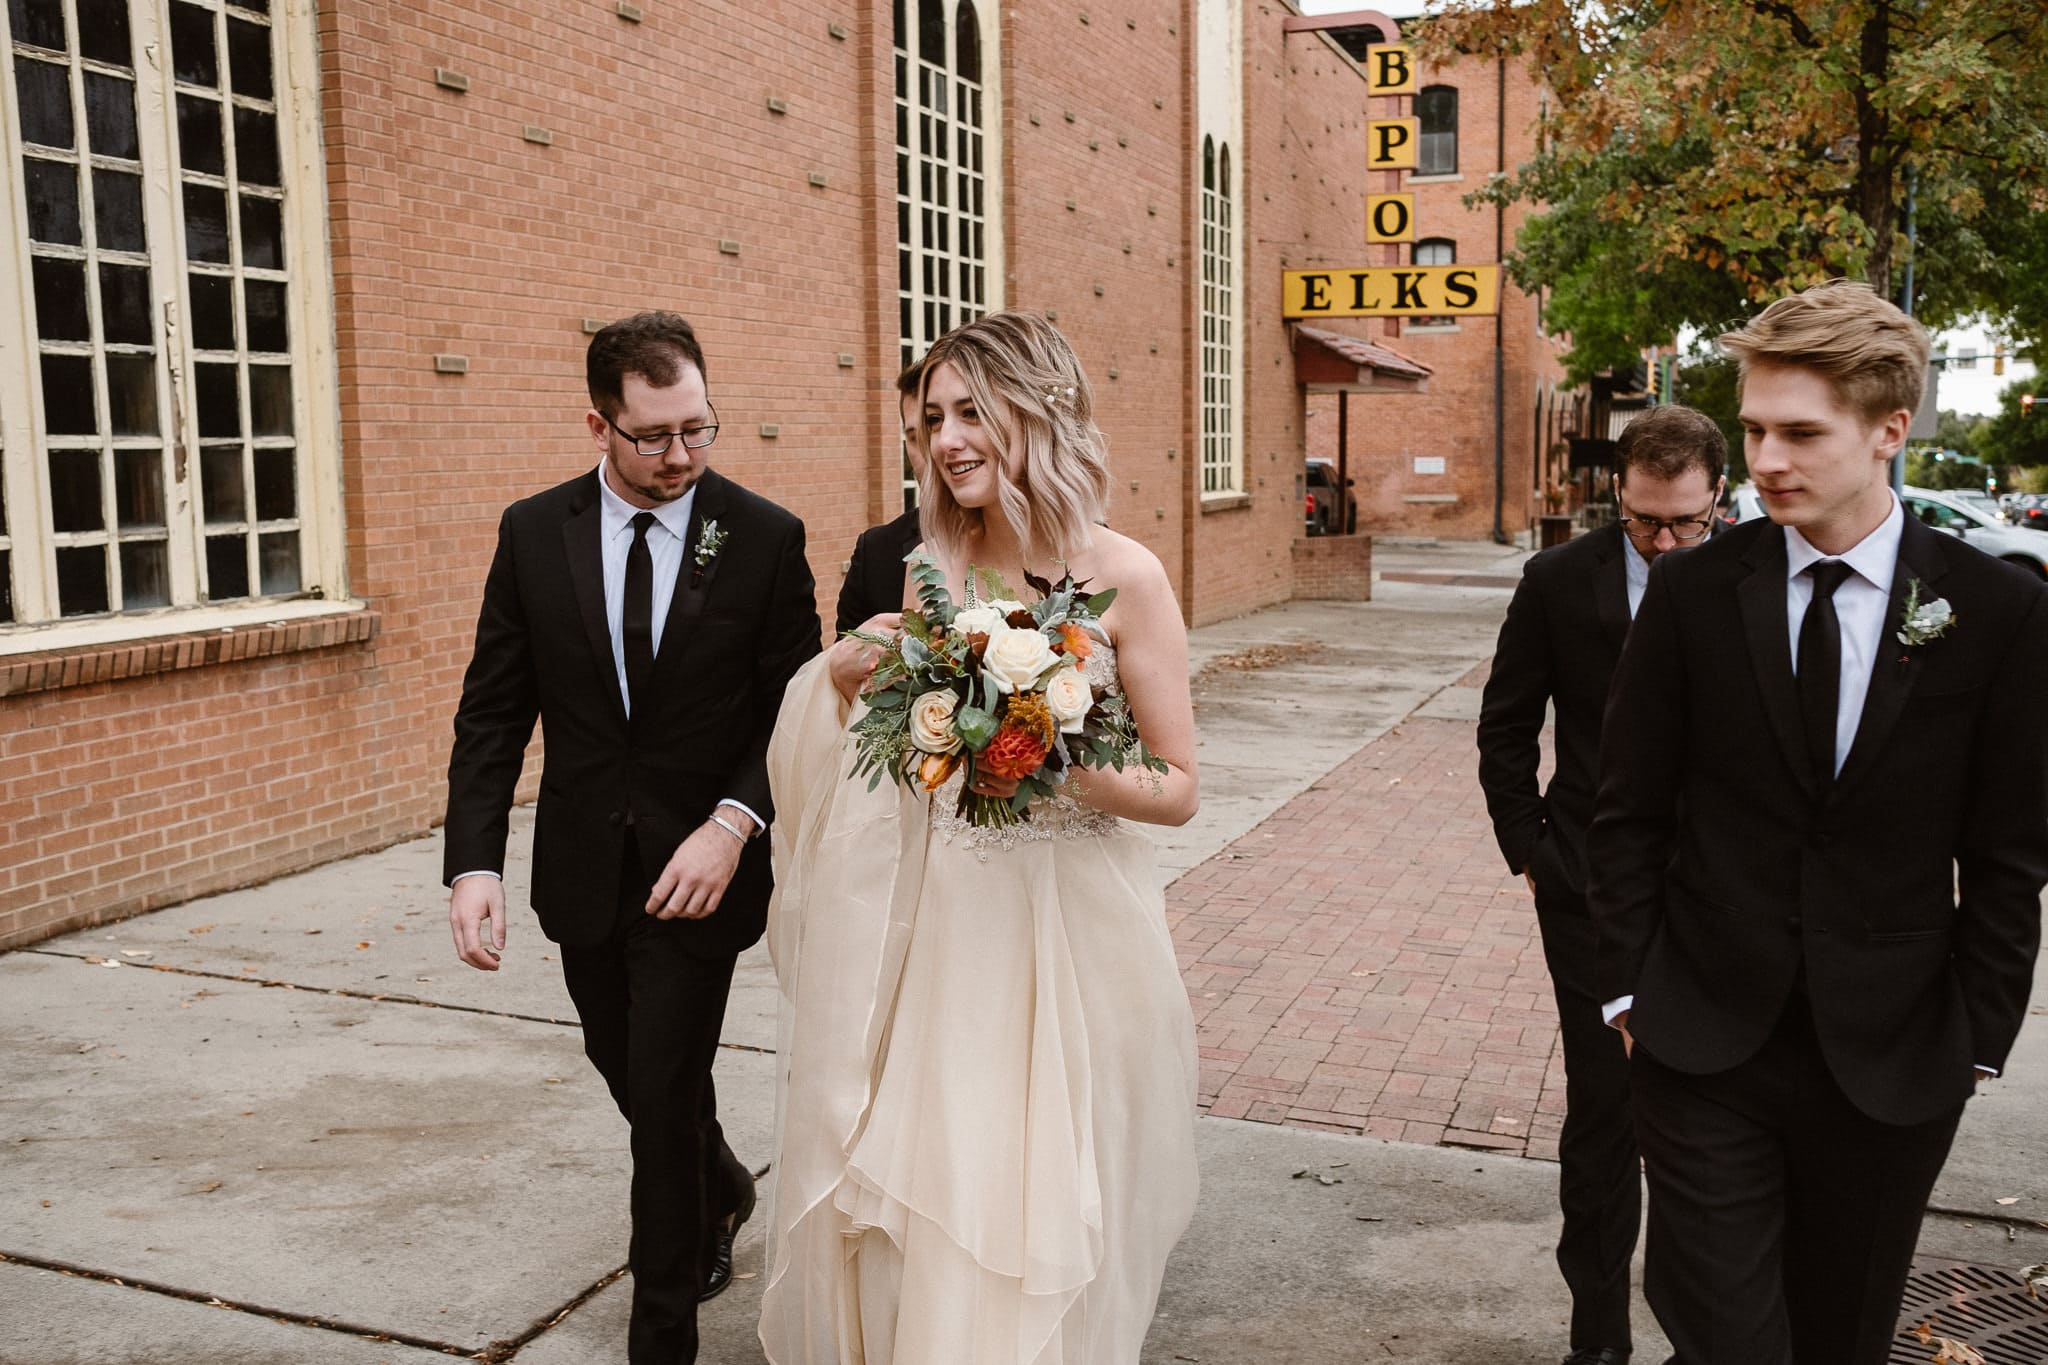 St Vrain Wedding Photographer   Longmont Wedding Photographer   Colorado Winter Wedding Photographer, Colorado industrial chic wedding, bride and groom with wedding party